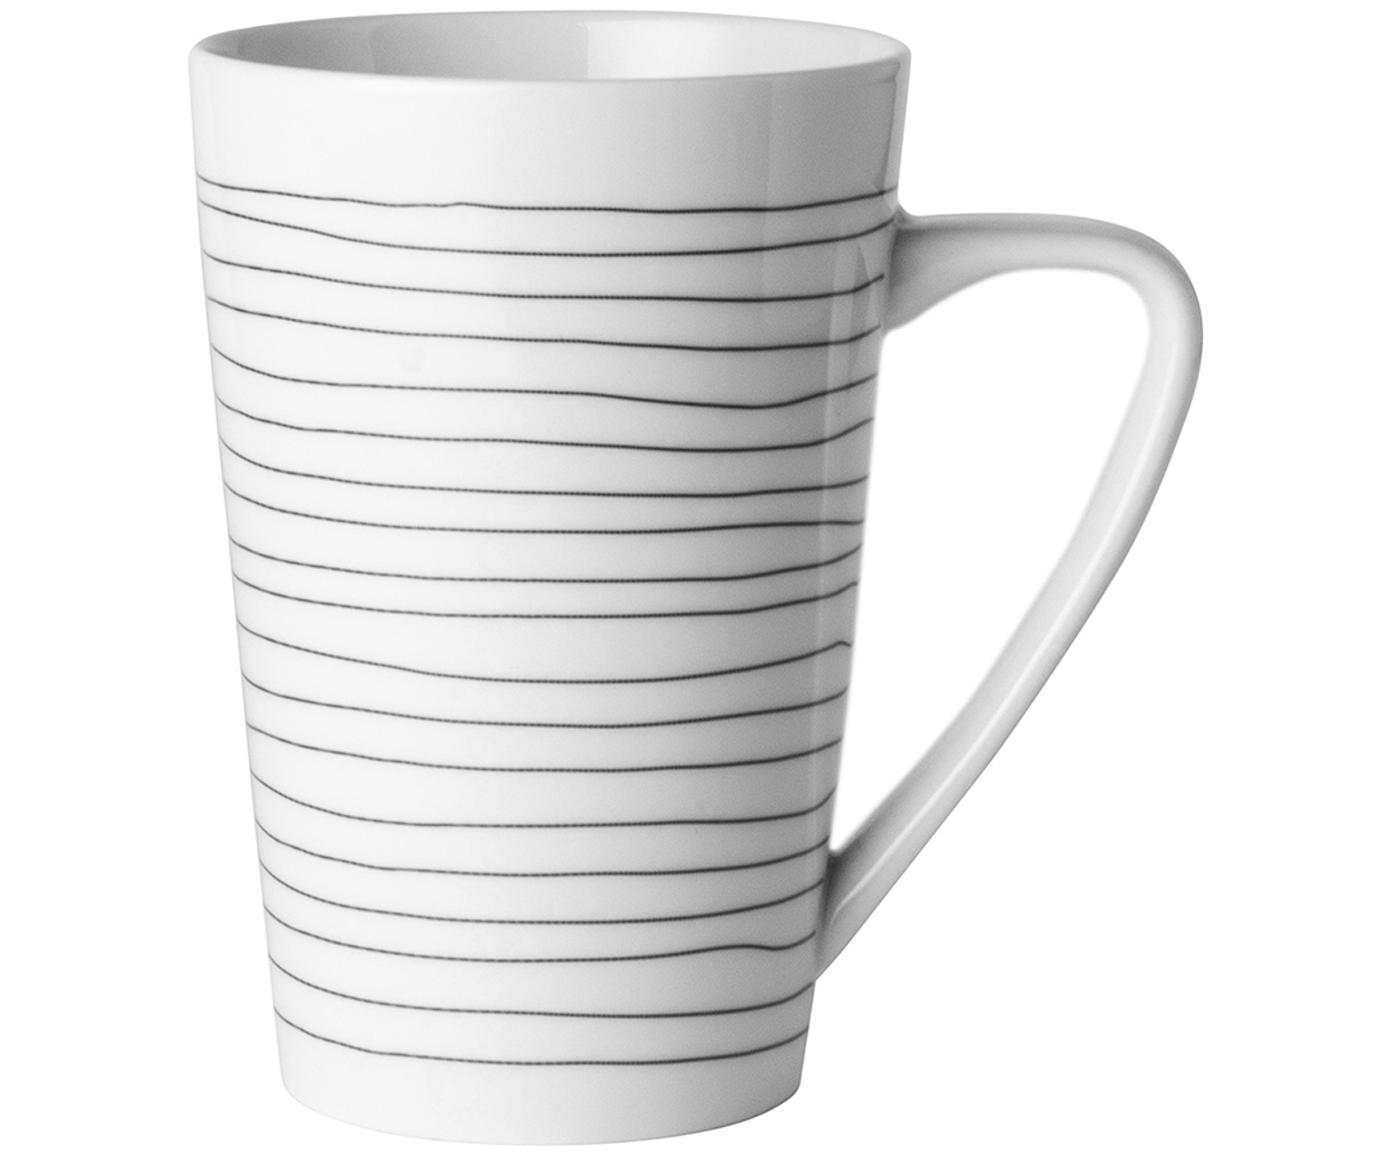 Tazas grandes ErisLoft, 4uds., Porcelana, Blanco, negro, Ø 9 x Al 13 cm